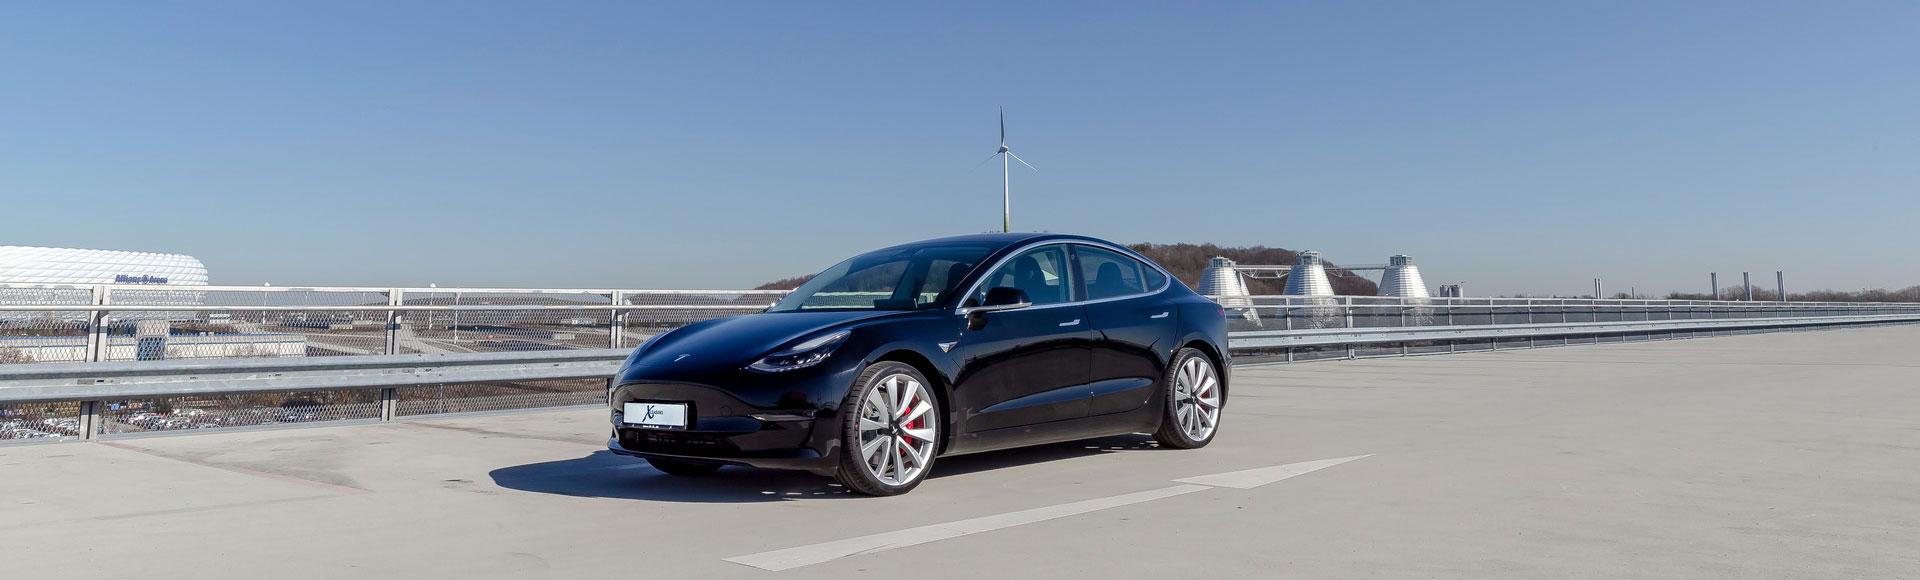 Tesla Model 3 2019 051